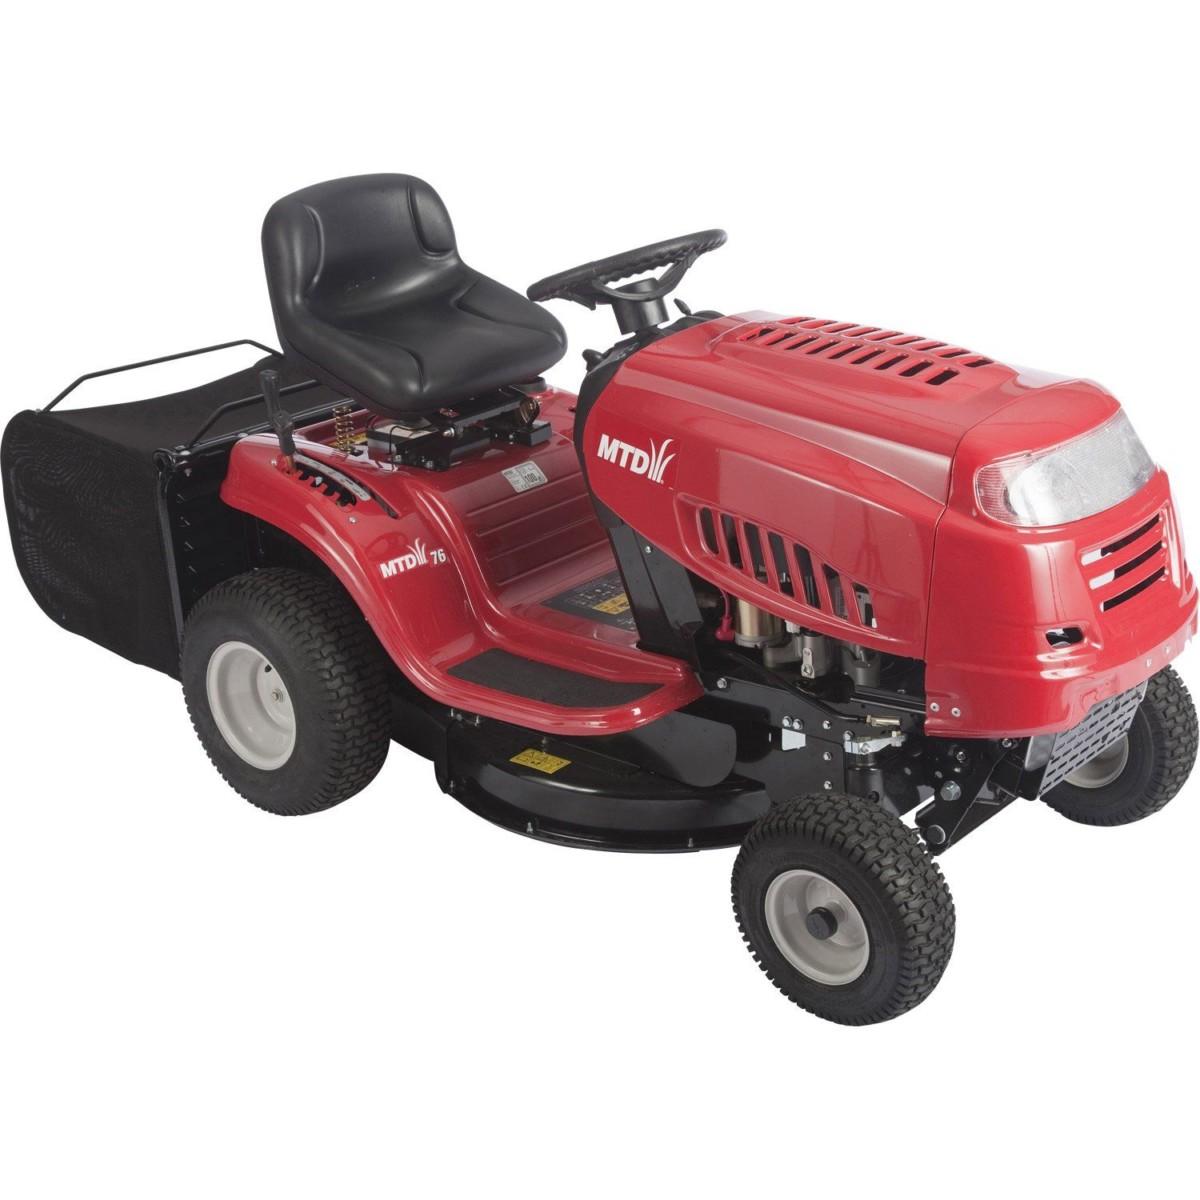 Tracteur tondeuse mulching topiwall - Tondeuse autoportee mulching ...